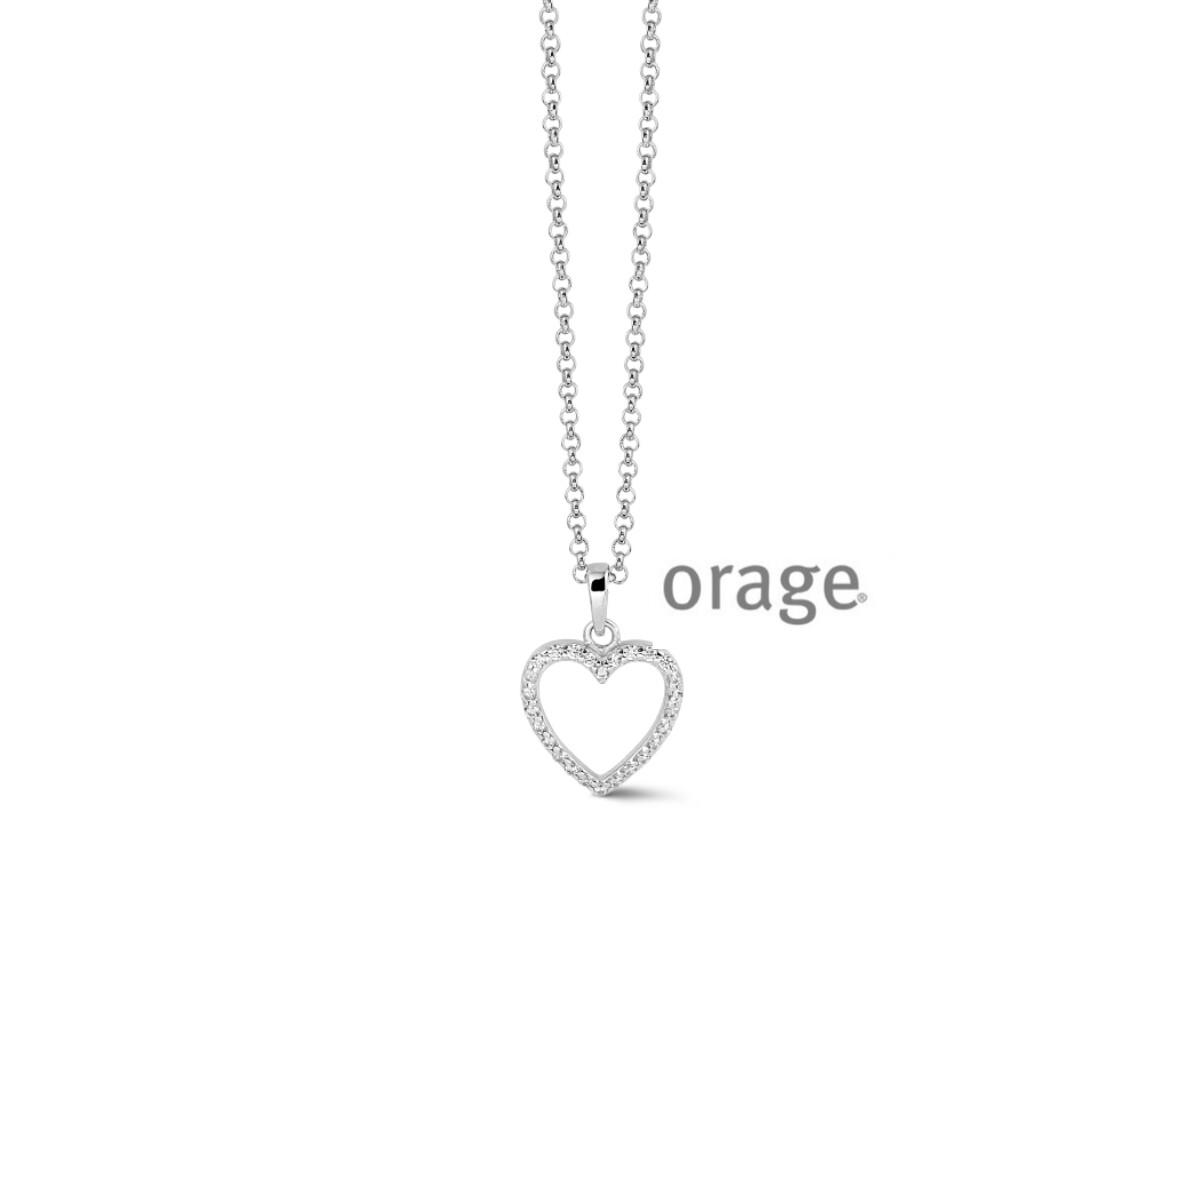 Collier Orage V1421